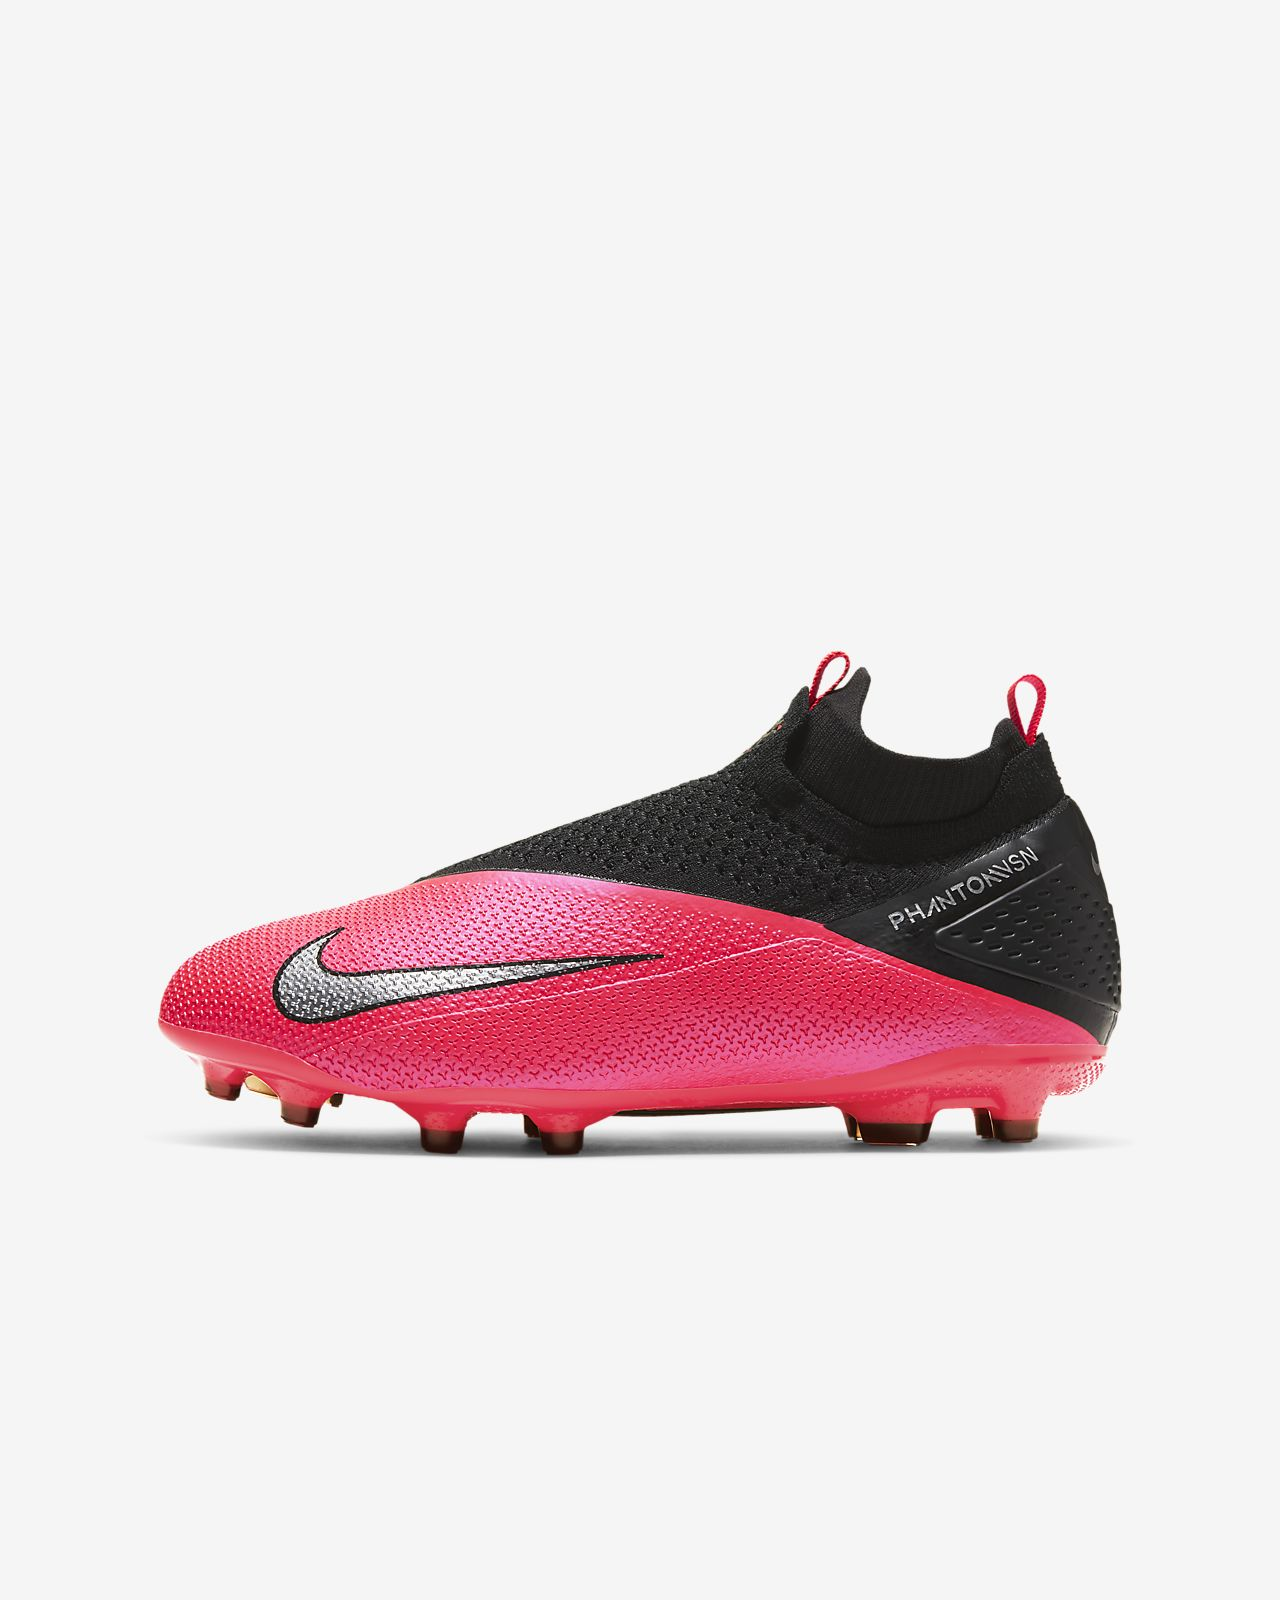 Nike Jr. Phantom Vision 2 Elite Dynamic Fit MG Older Kids' Multi Ground Football Boot